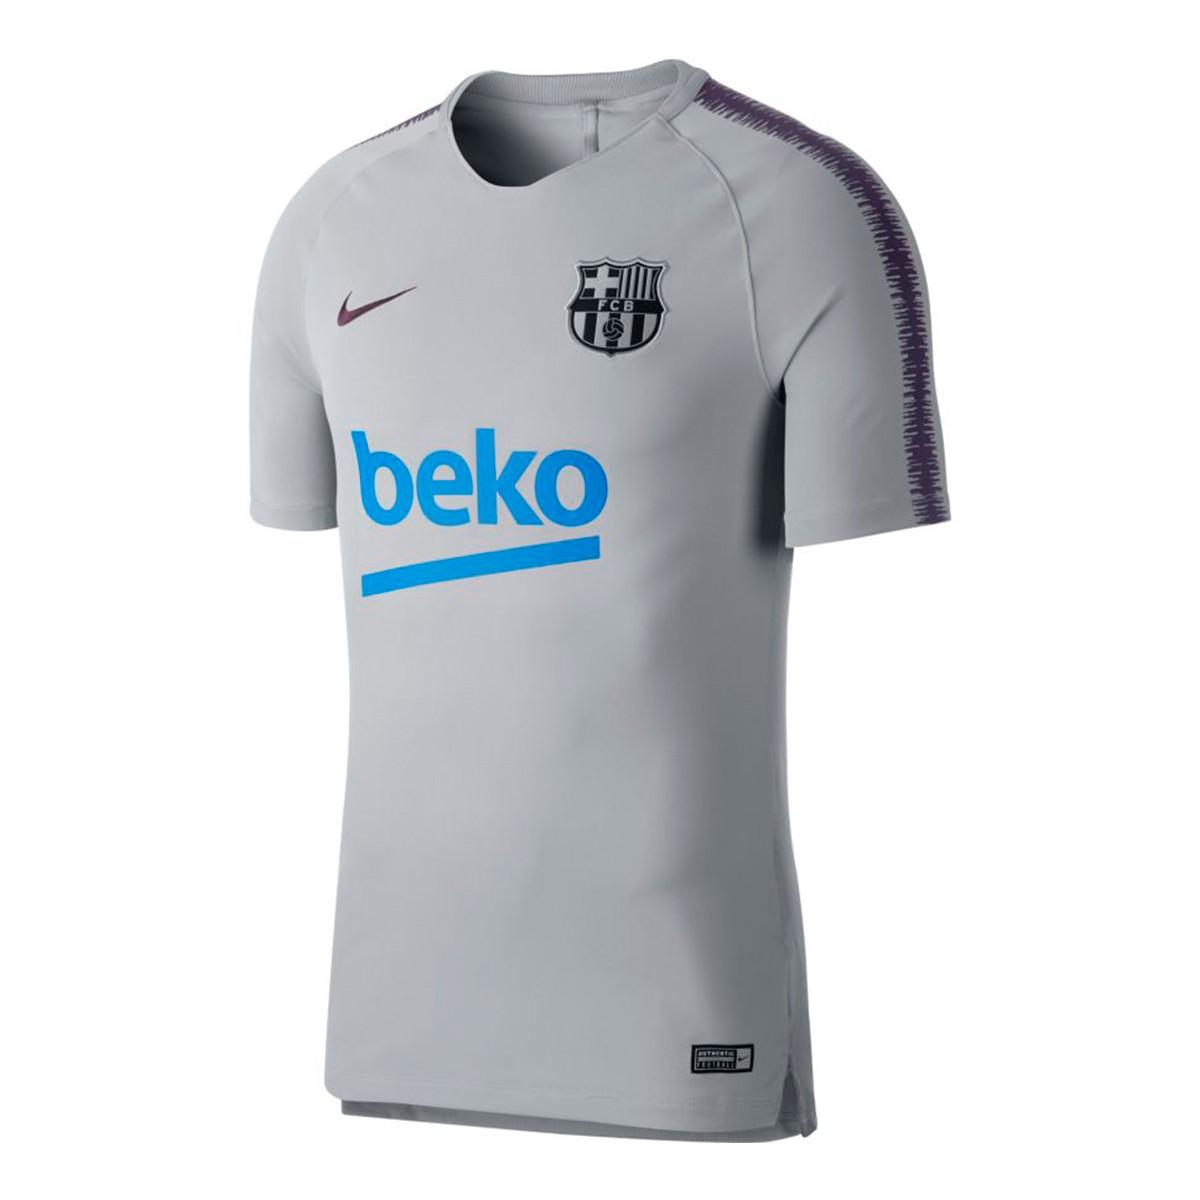 1026539d25f Jersey Nike FC Barcelona Squad 2018-2019 Wolf grey-Purple dynasty ...